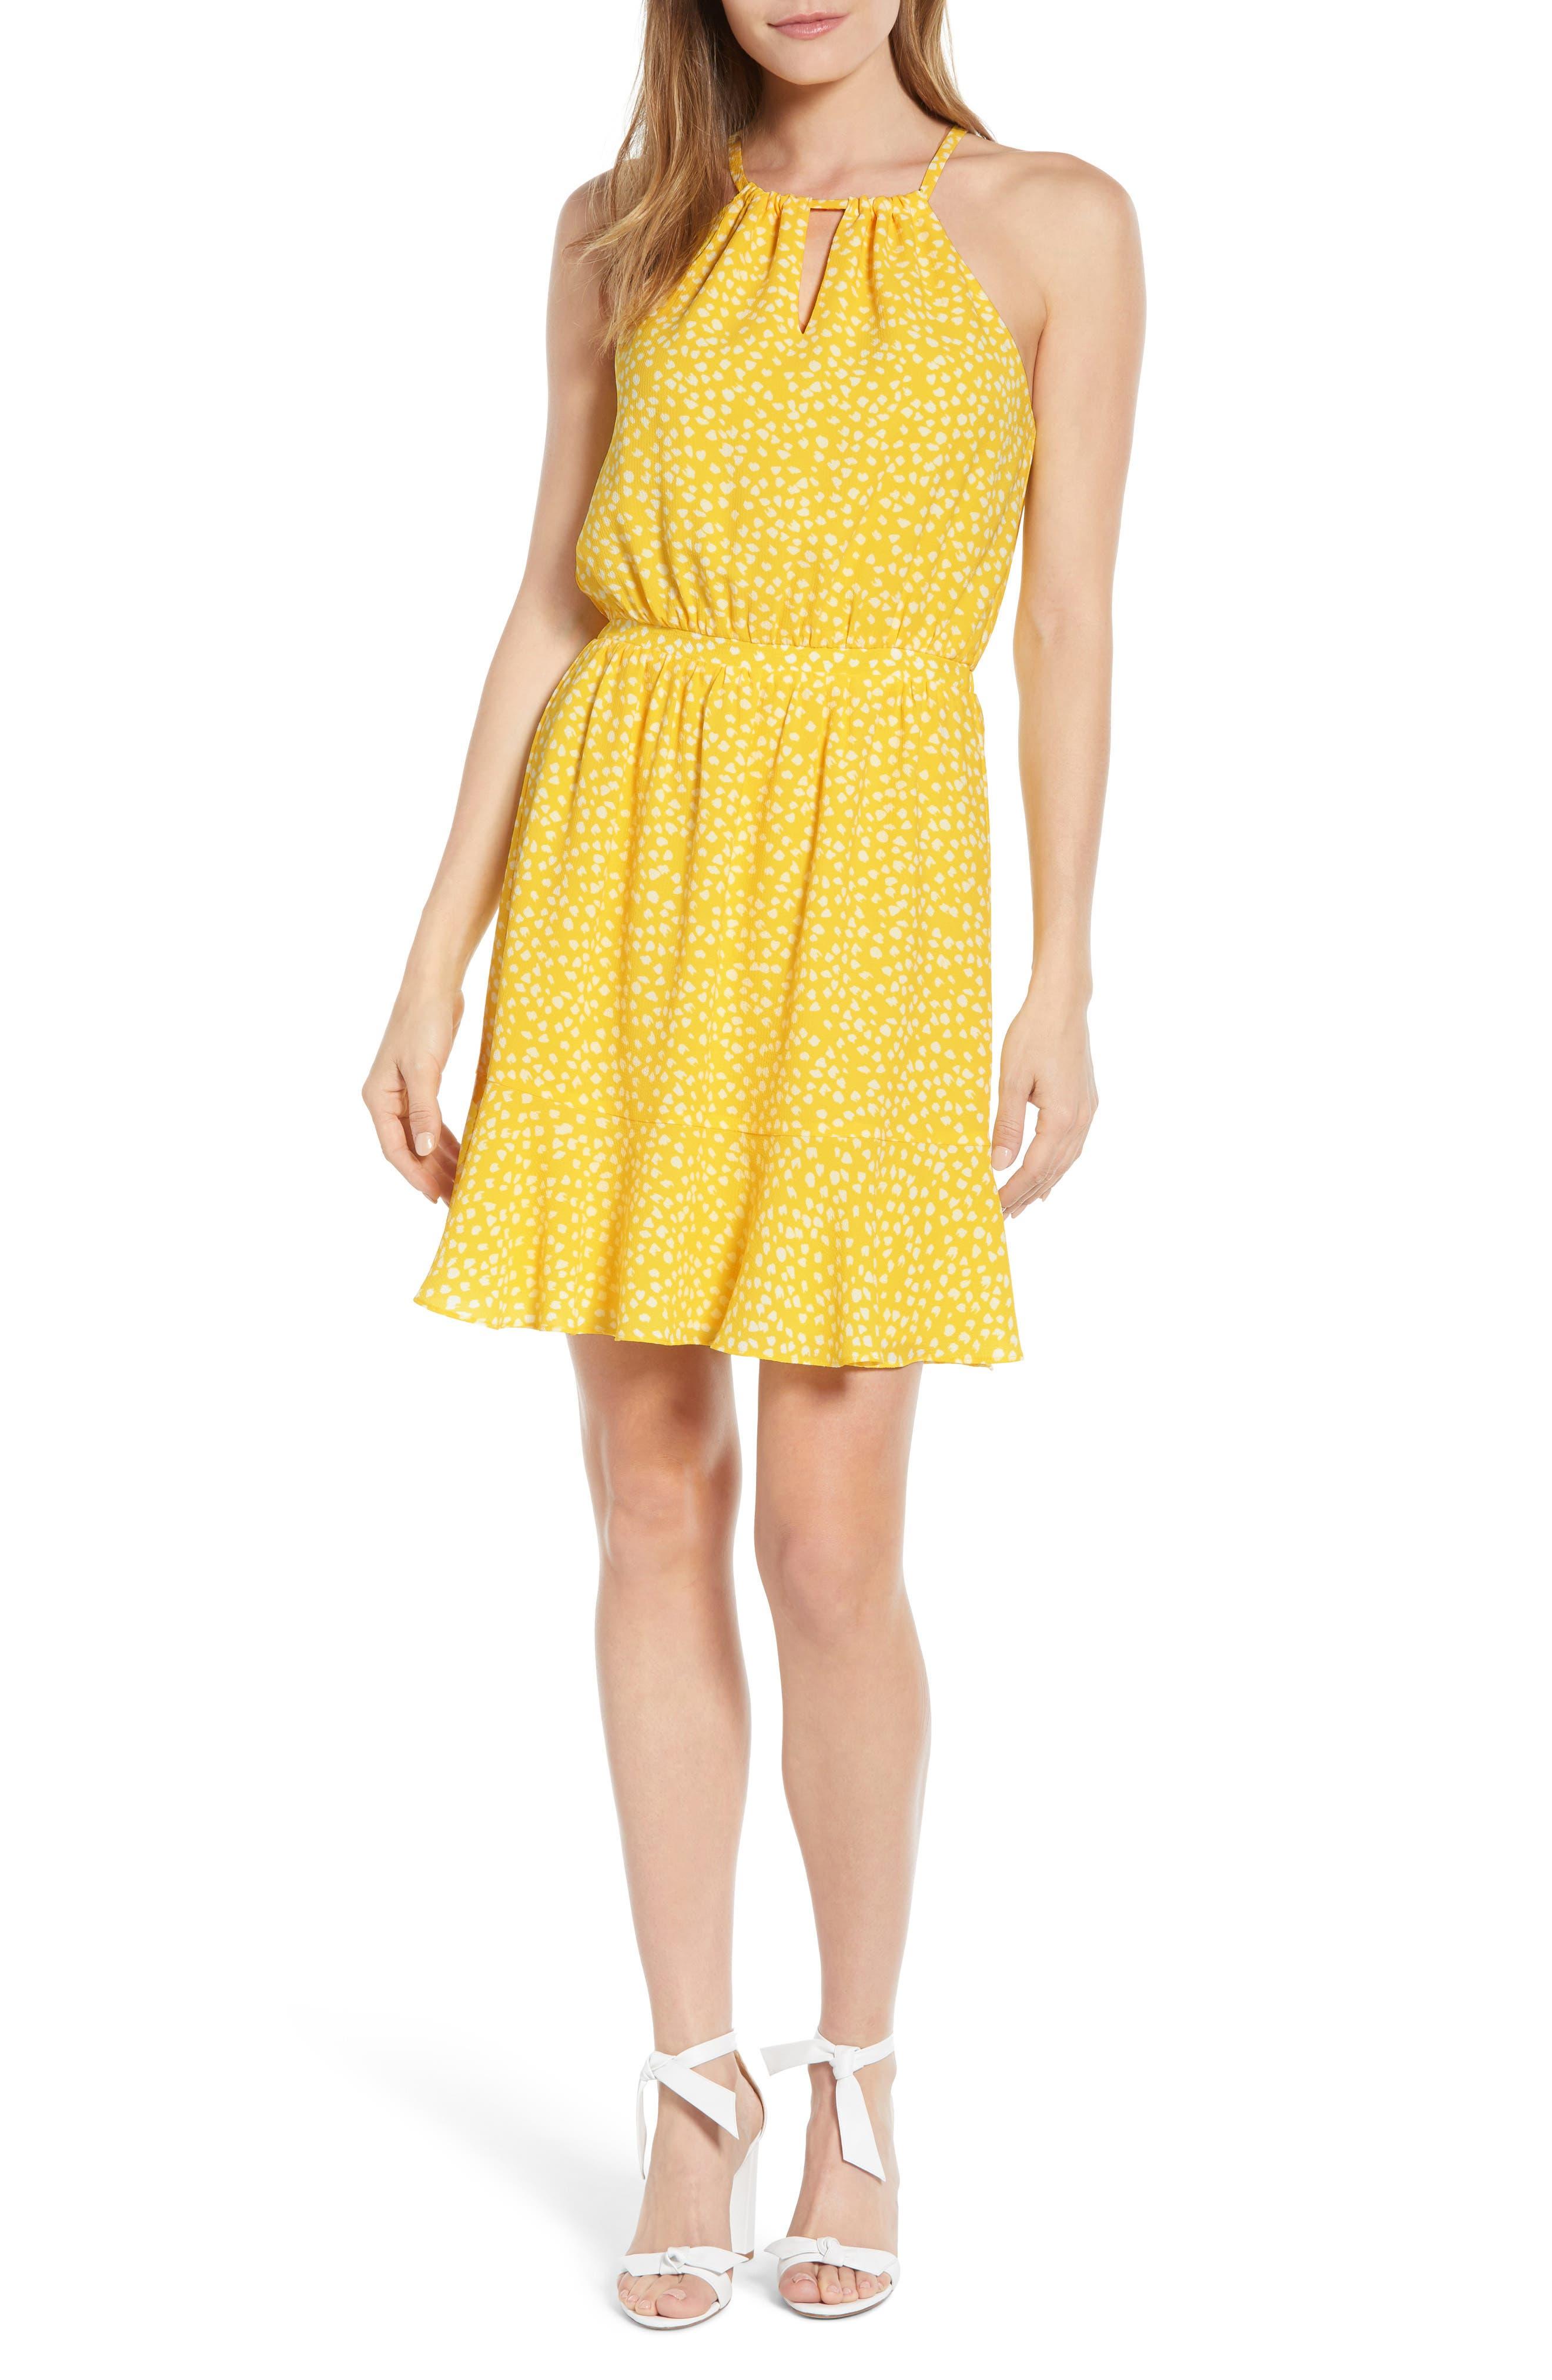 Petite Gibson X Living In Yellow Calla Keyhole Halter Neck Dress, Yellow (Regular & Petite) (Nordstrom Exclusive)